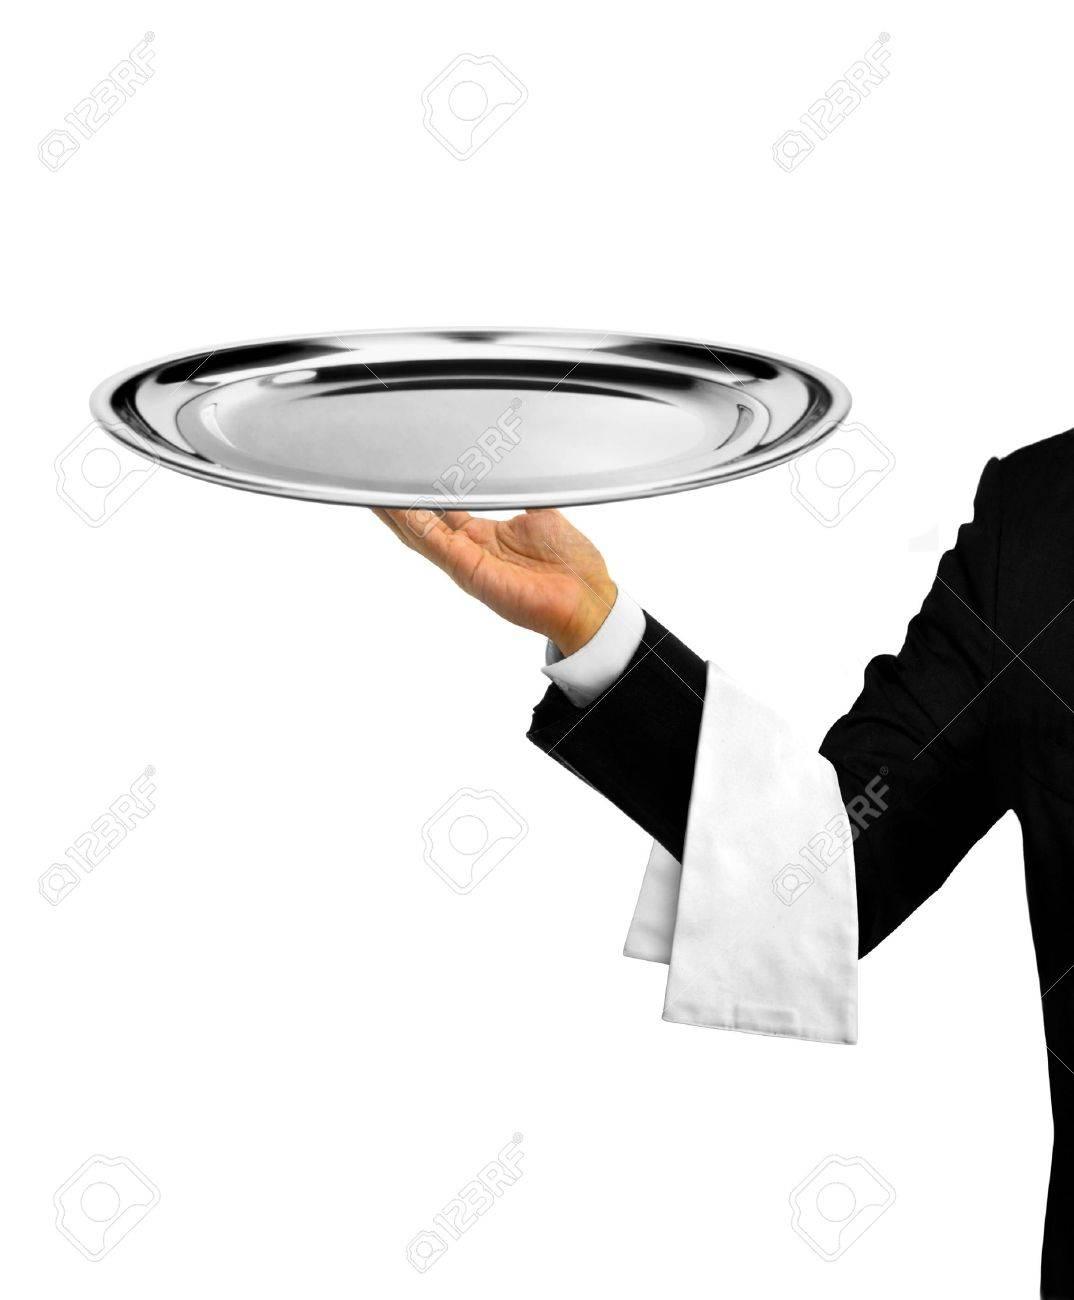 Waiter Serving Empty Platter - 35180429